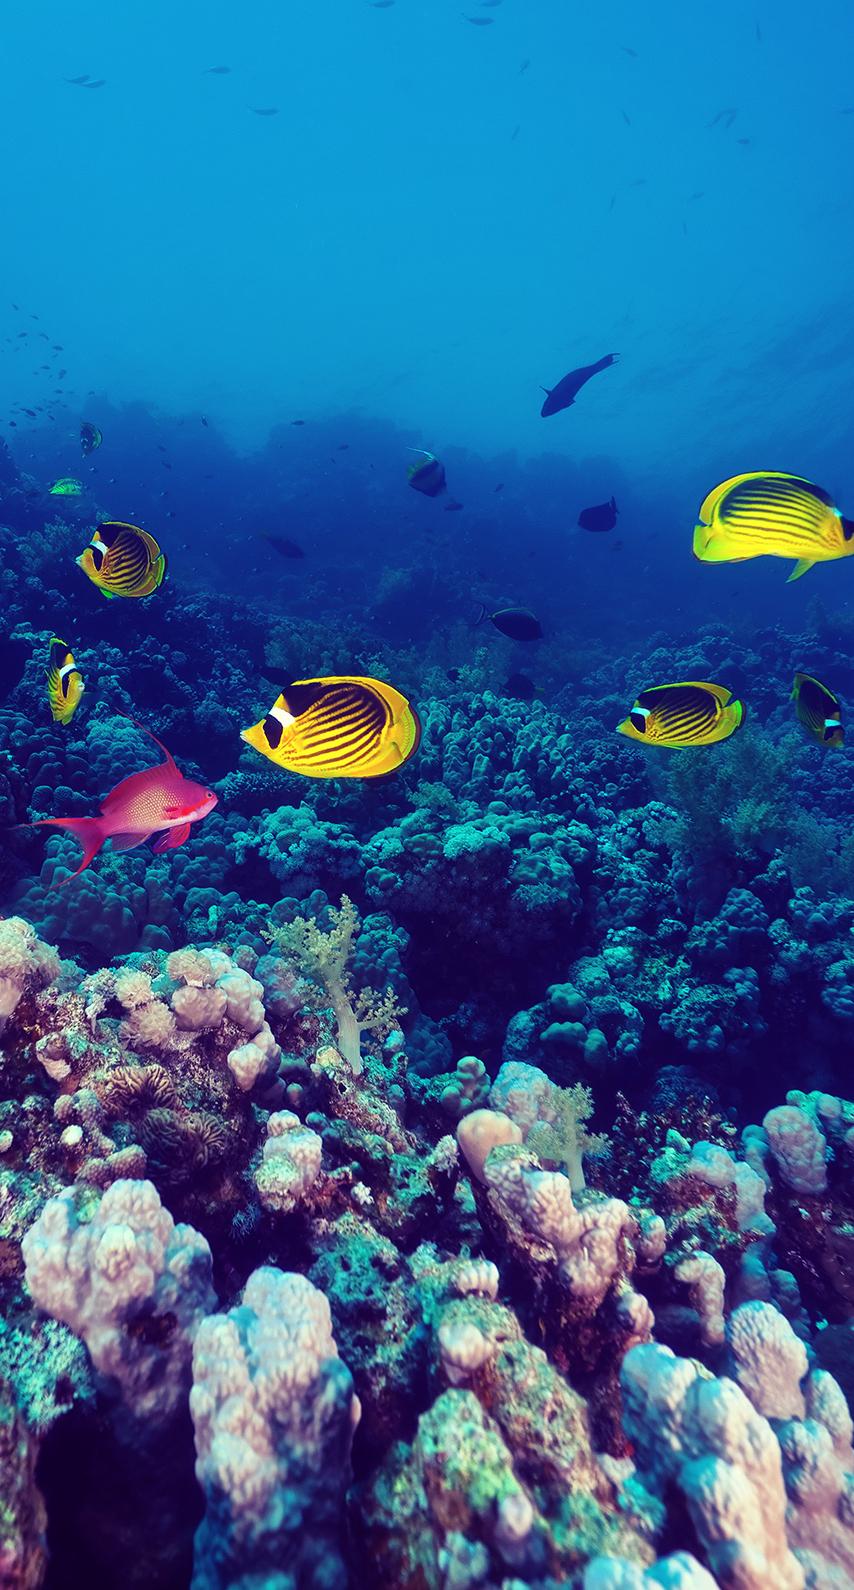 organism, marine biology